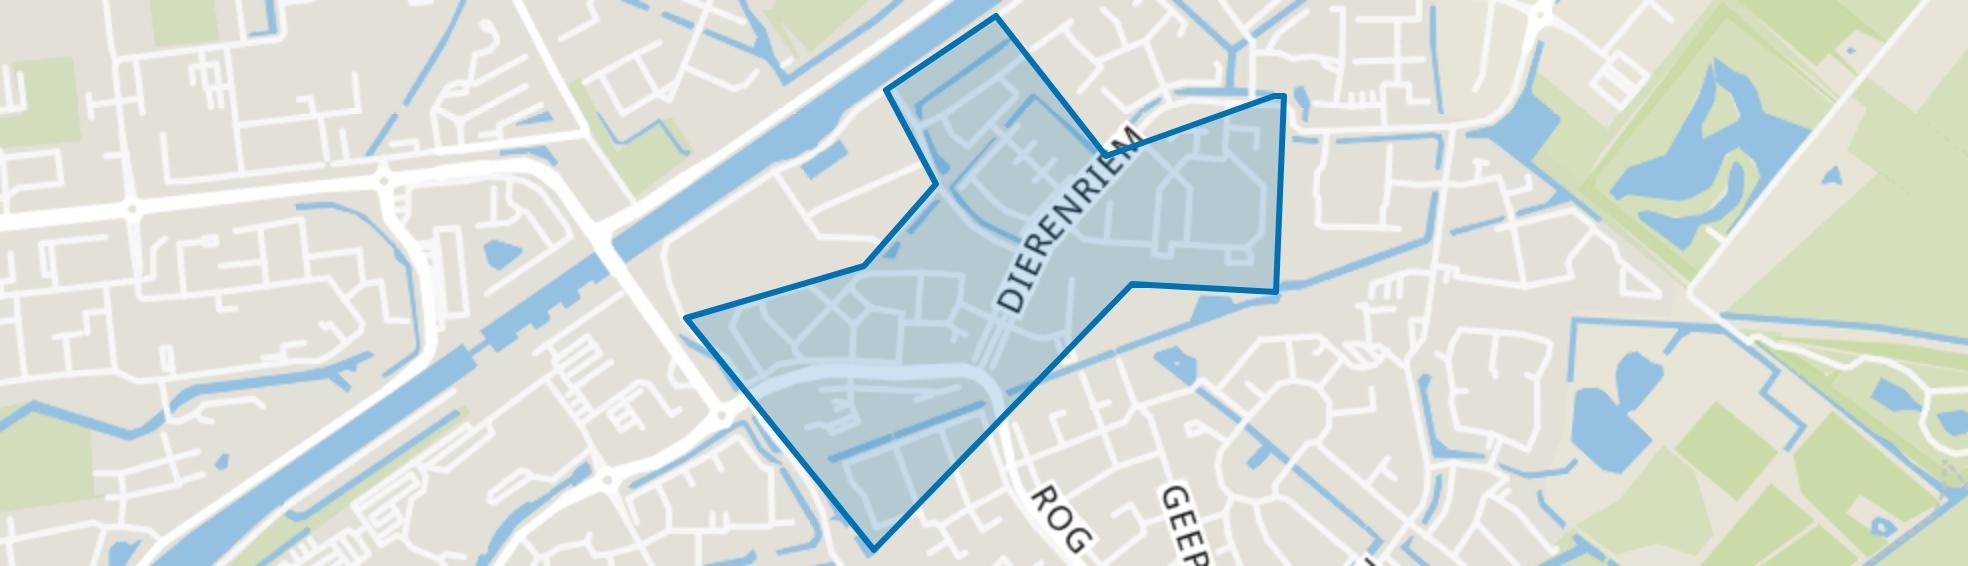 Koele Nacht, Hellevoetsluis map